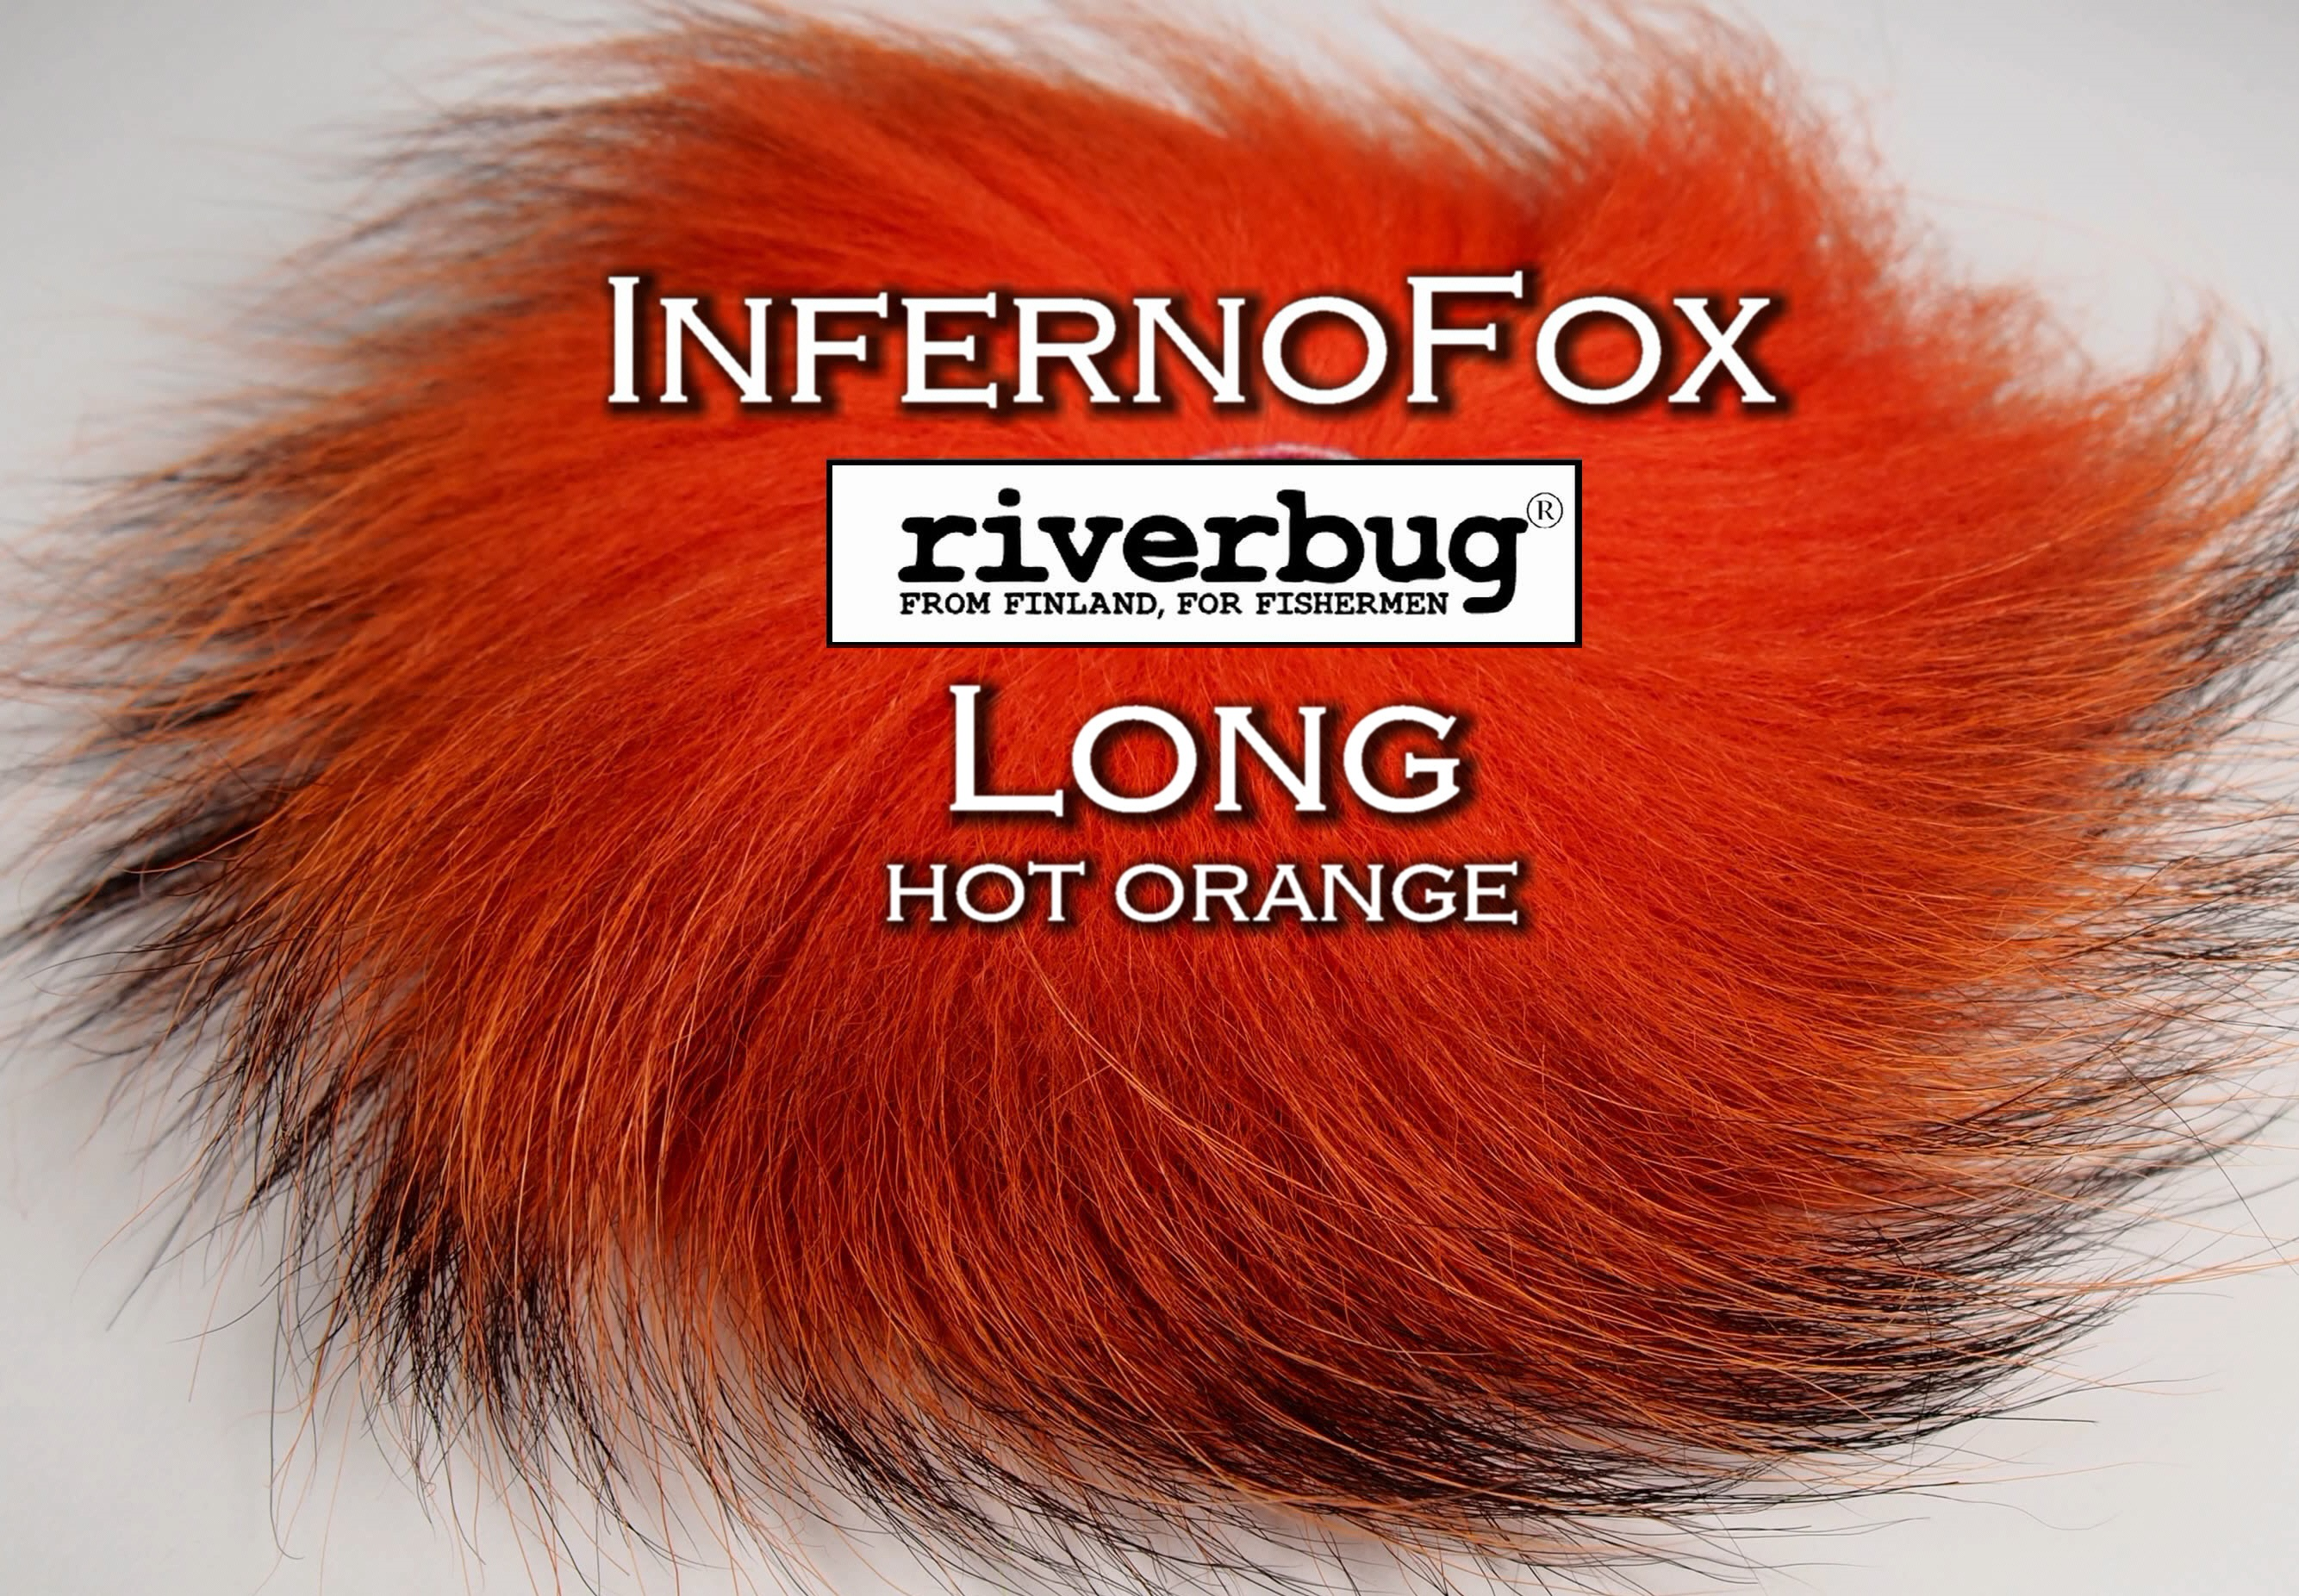 RiverBug / Beggar Fox materials. Color Hot Orange. Good for any kind of salmon and trout flies. #putkiperho #tubefly #tubfluga #flytying #finn #finnlures #finland #riverbug #ketunkarva #foxfur #hotfoxfur #hotorange